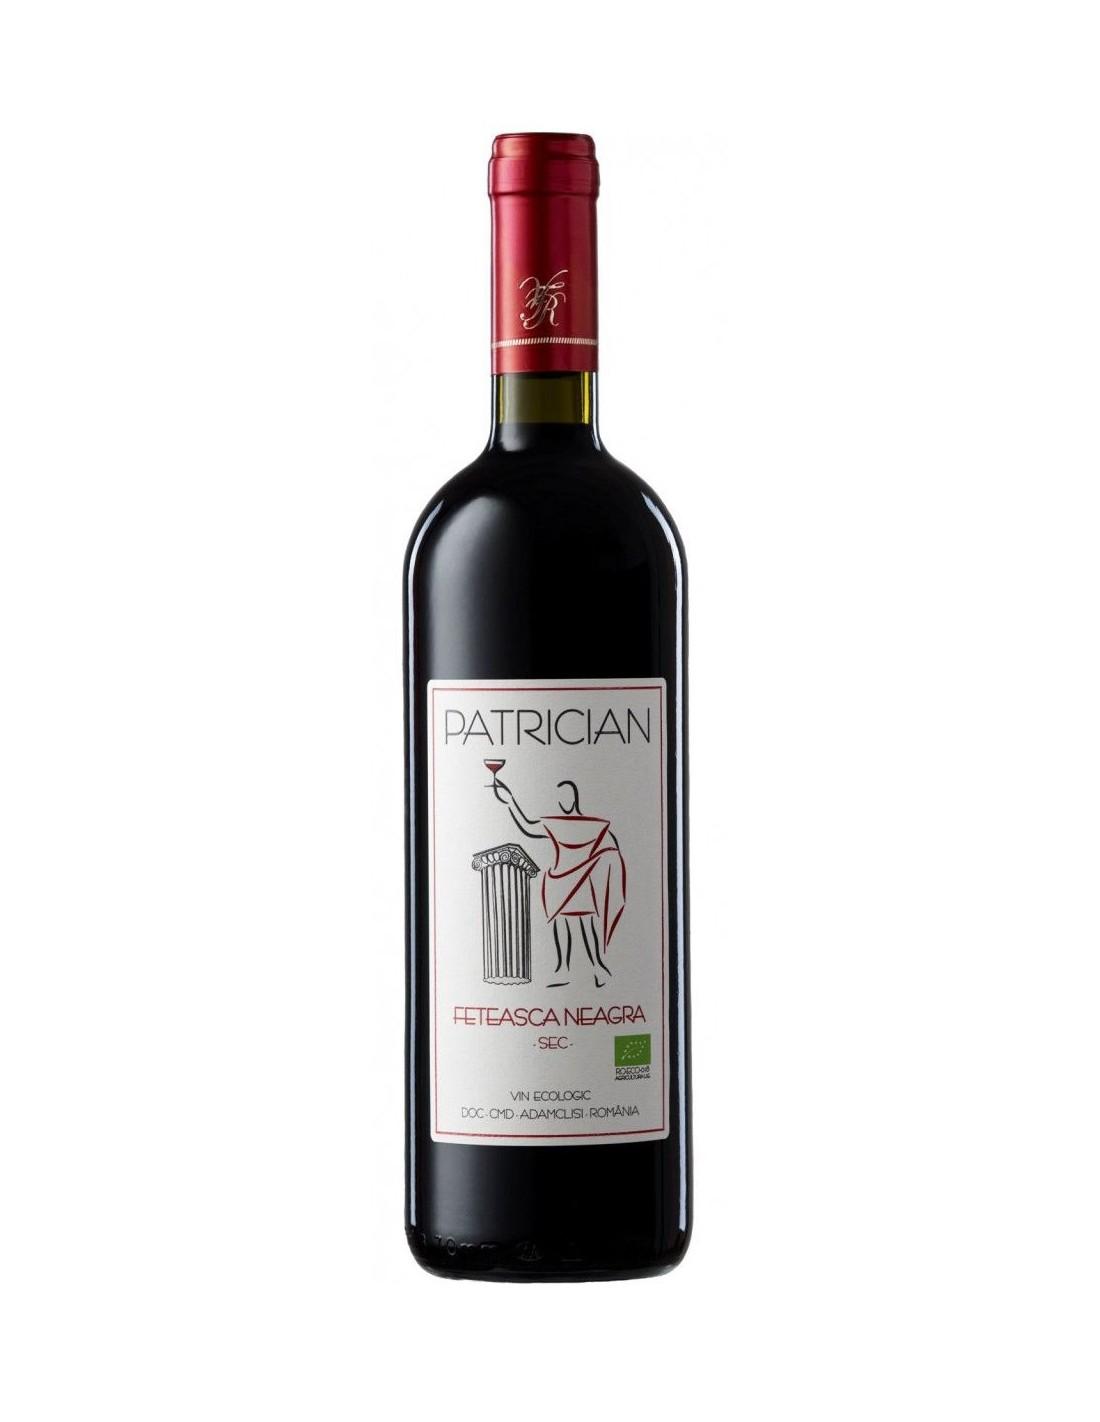 Vin rosu sec, Feteasca Neagra, Patrician Adamclisi, 0.75L, 13% alc., Romania